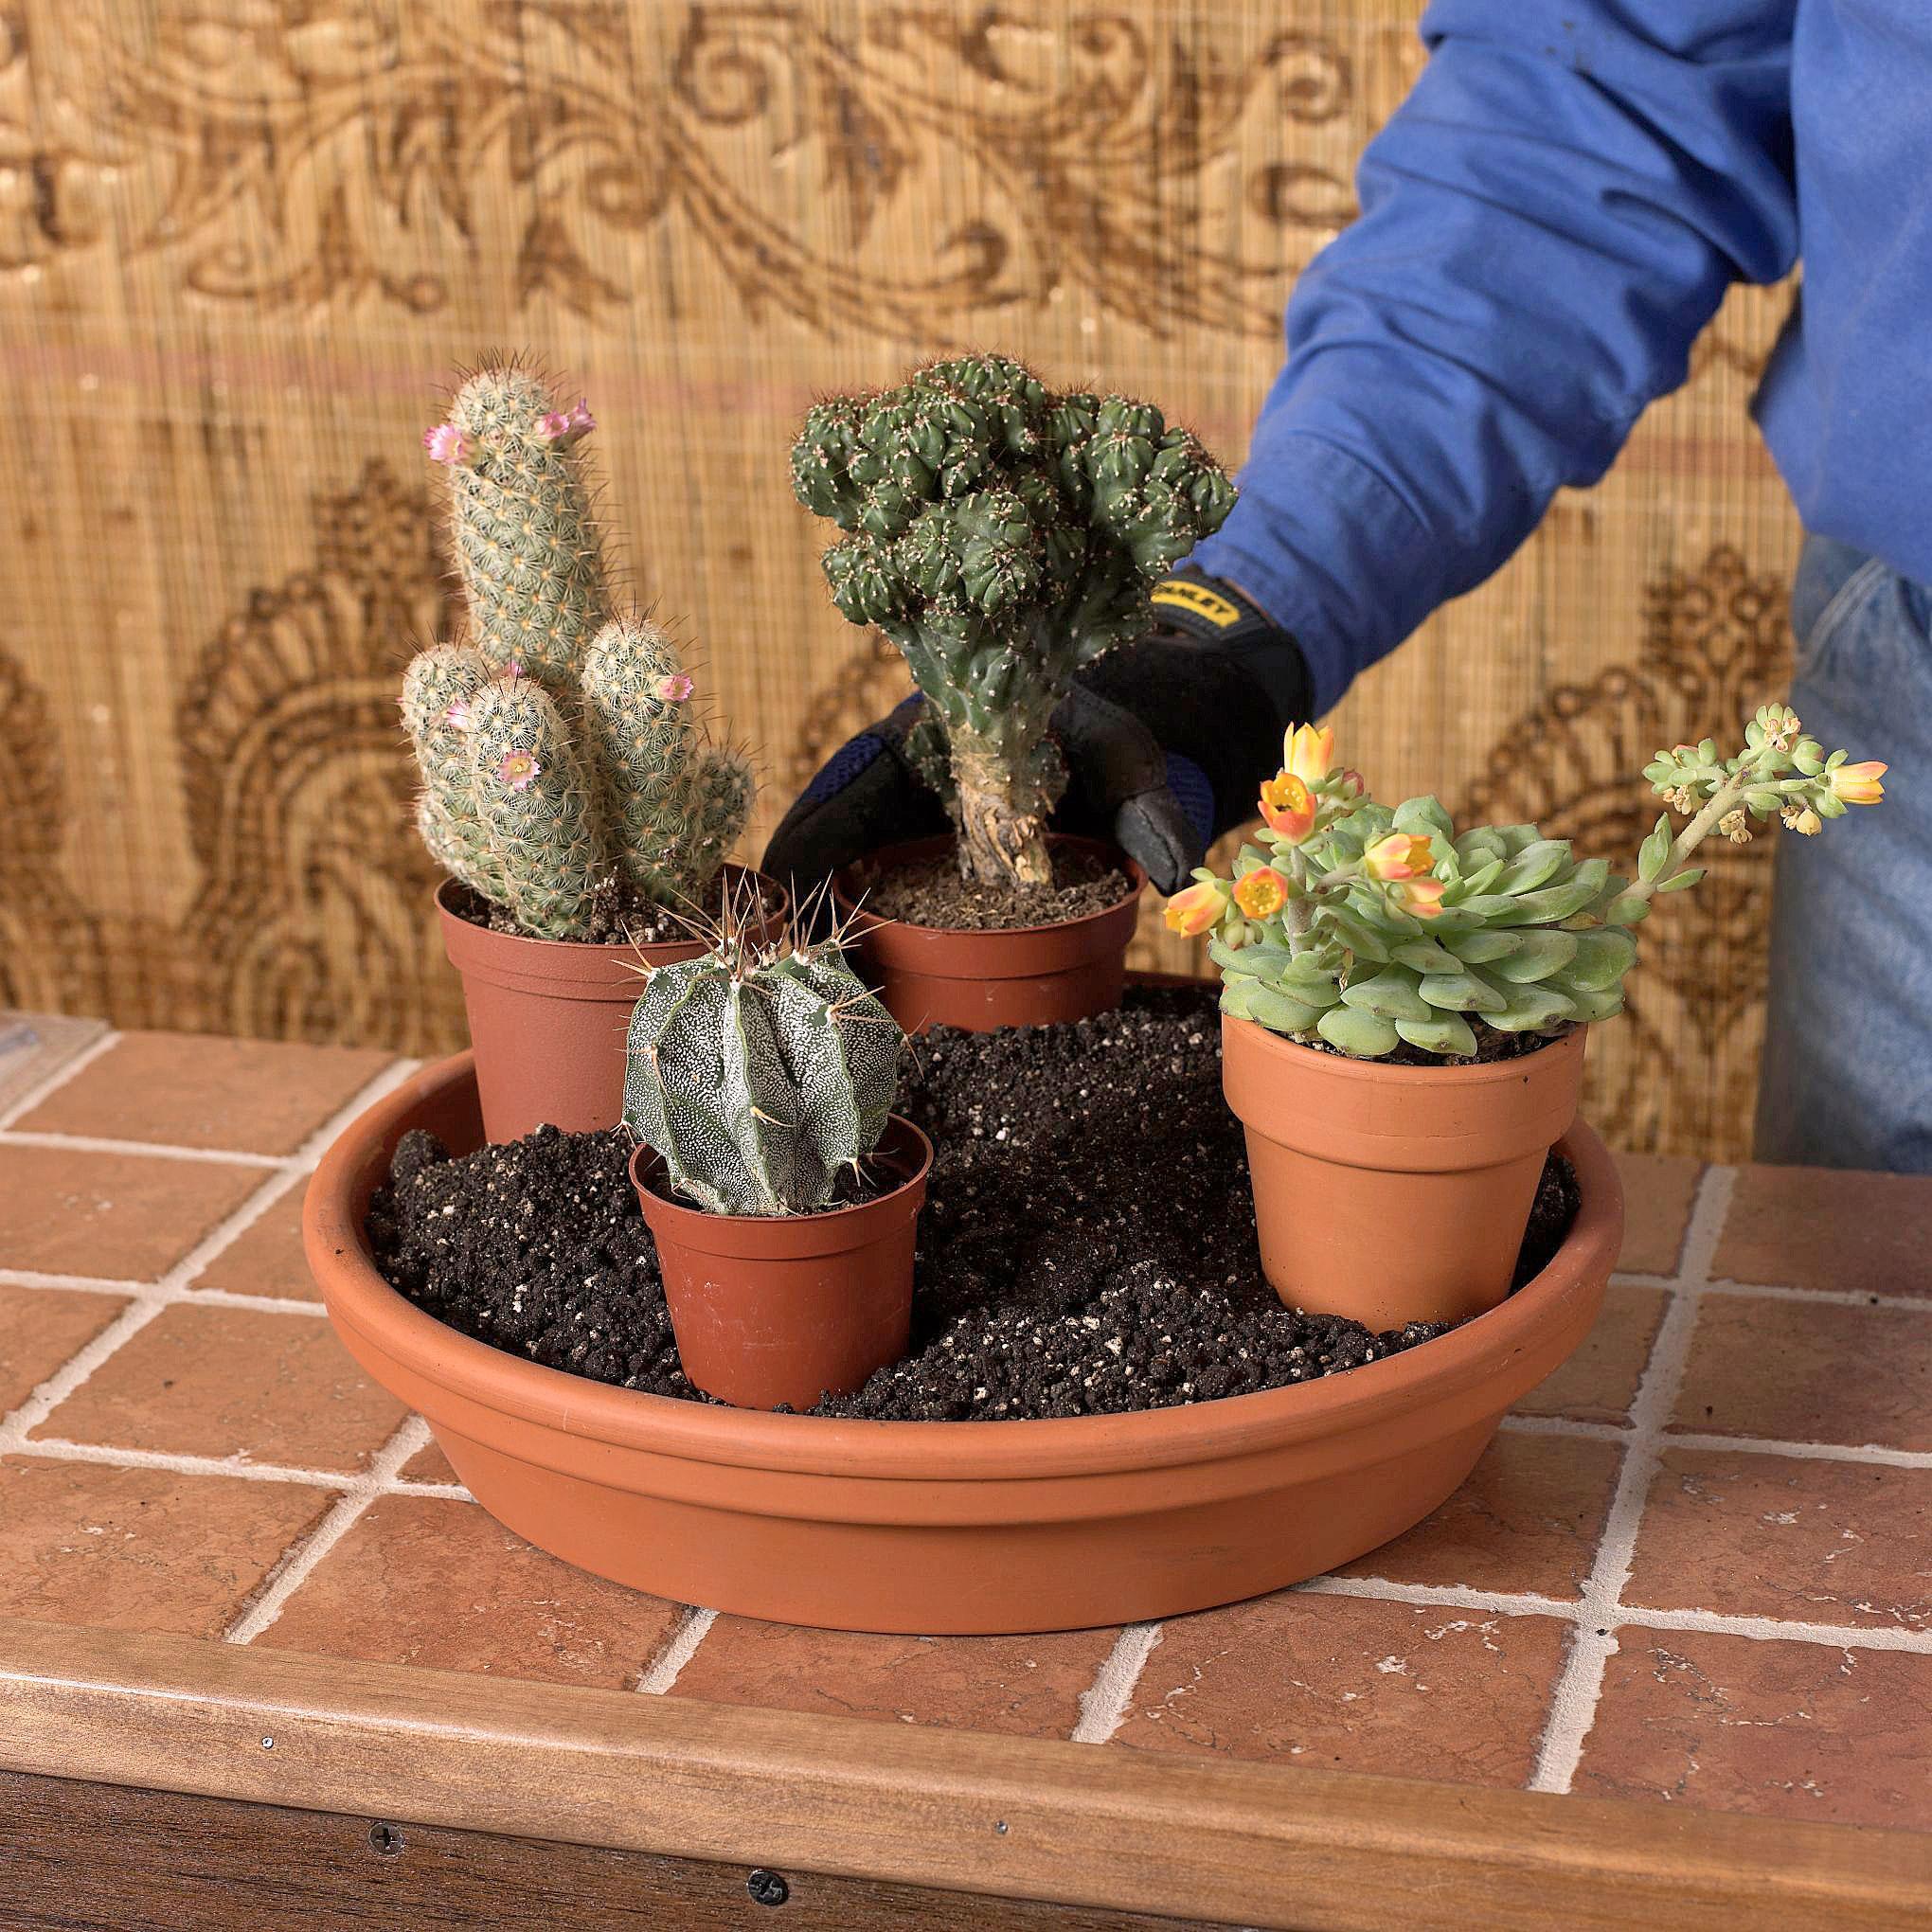 Arranging the cacti